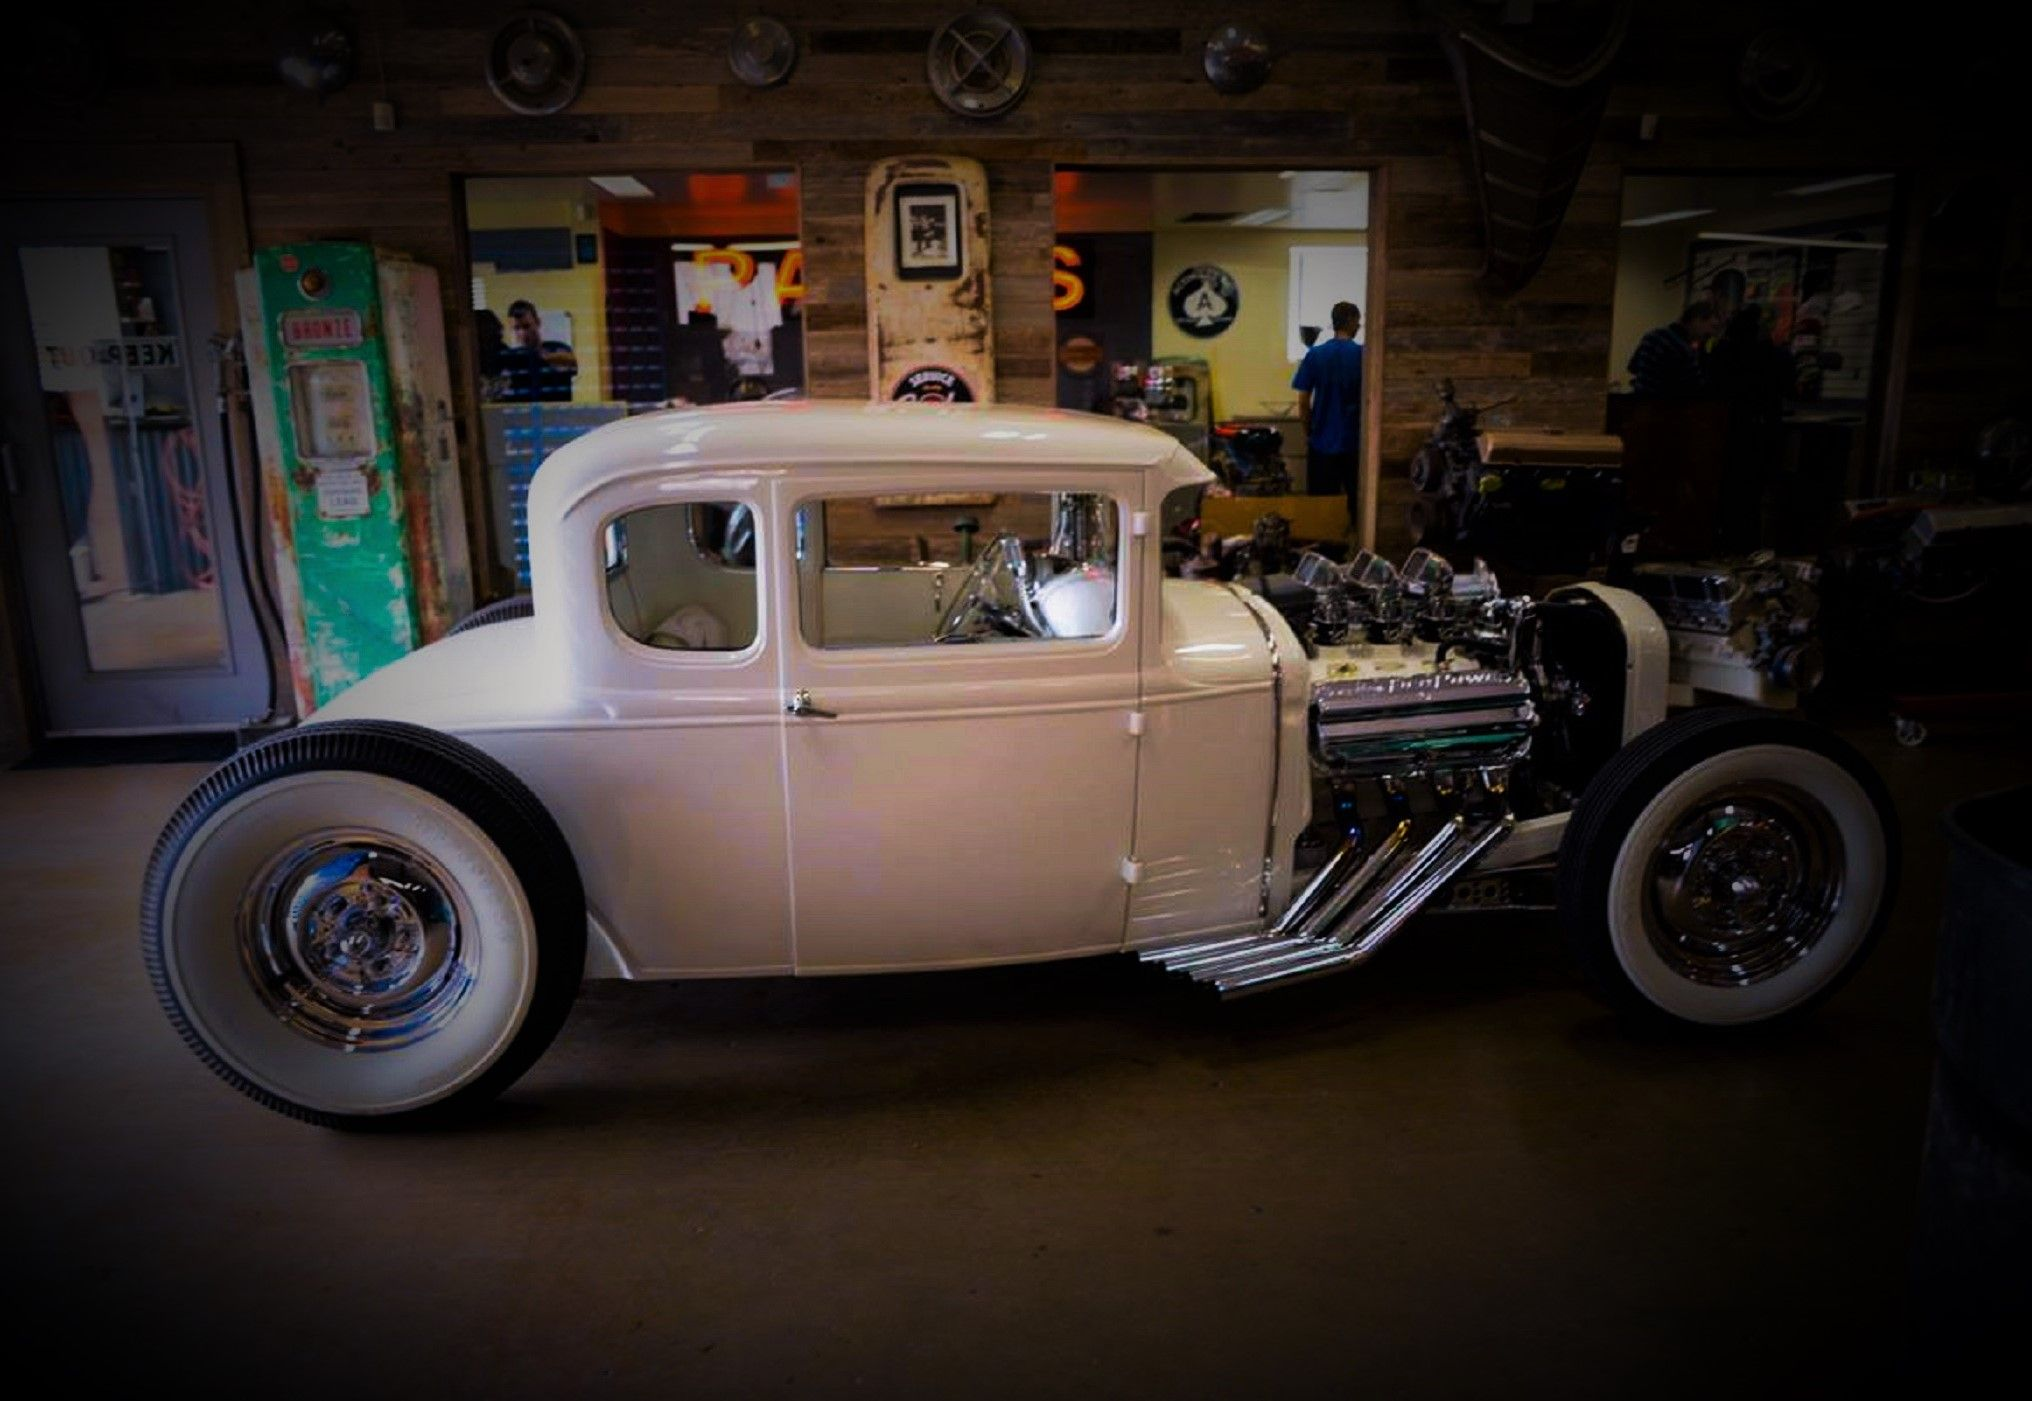 Paul teutul senior s white beauty 1931 model a ford hot rod built by